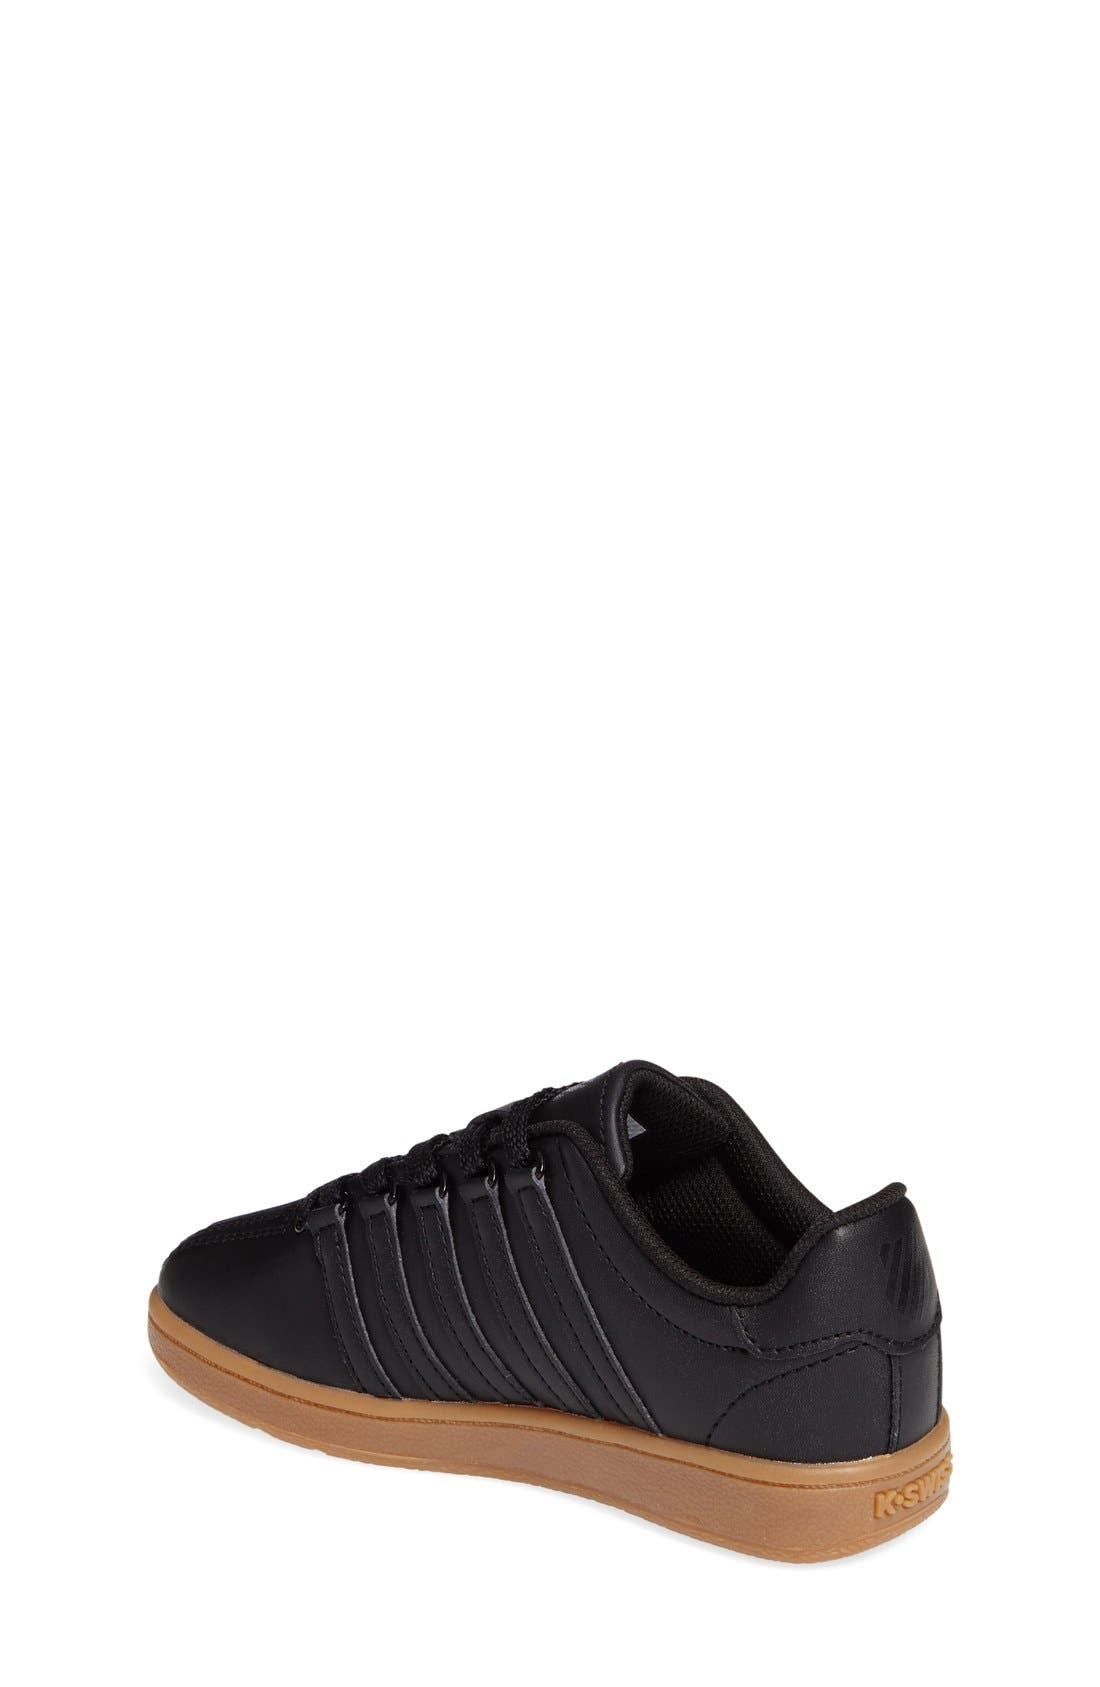 'Classic' Sneaker,                             Alternate thumbnail 12, color,